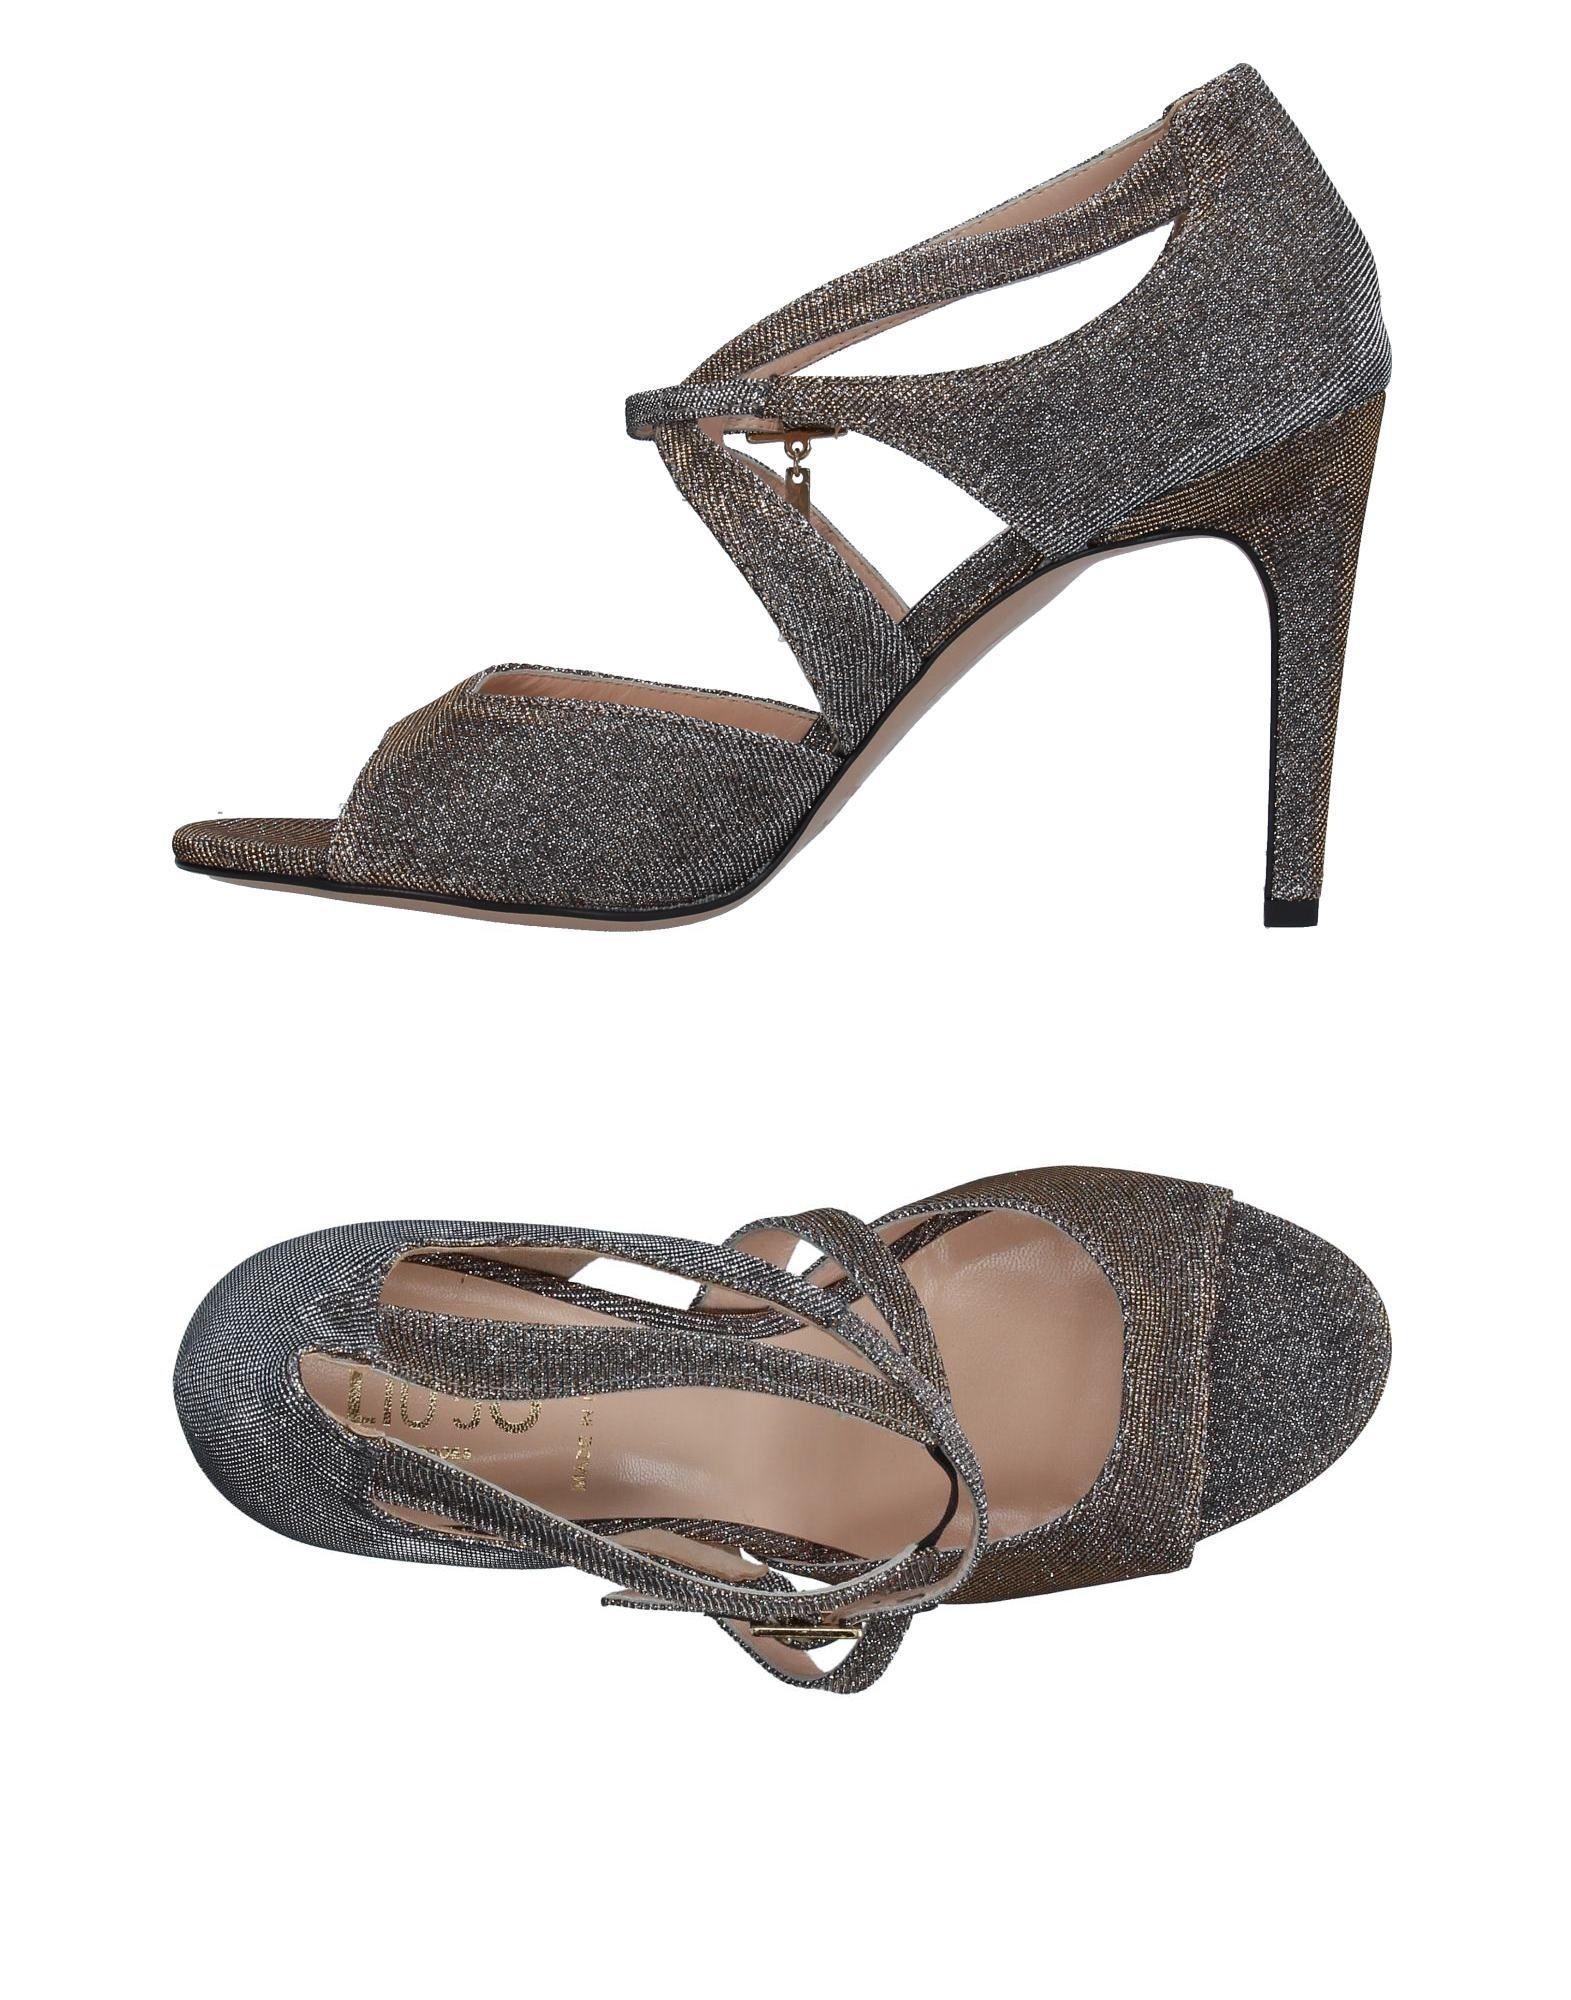 f68d127406a Sandals   Flip-Flops - Buy Best Sandals   Flip-Flops from Fashion  Influencers